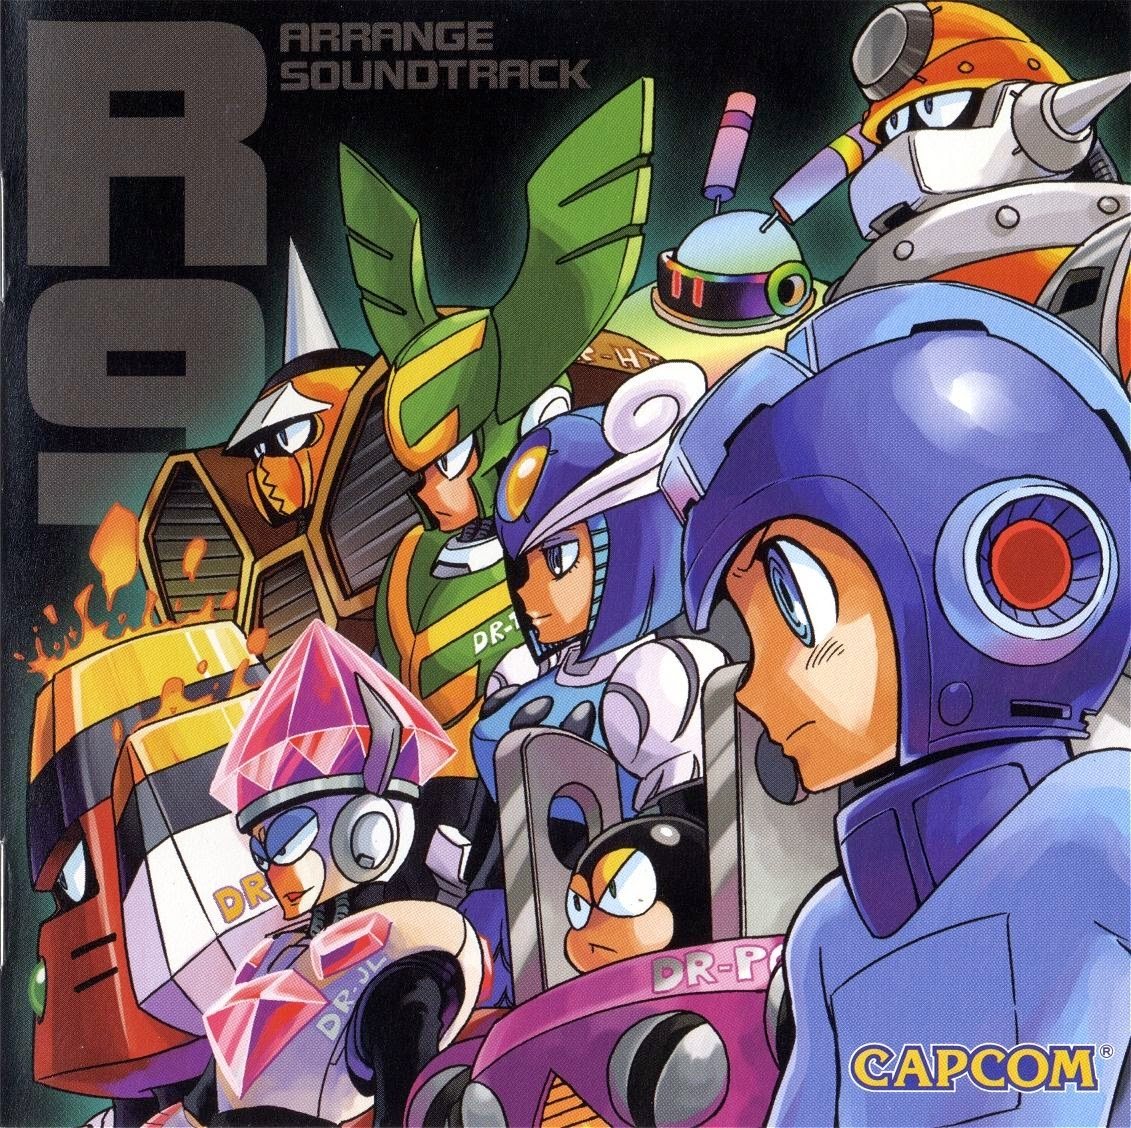 Rockman music enero 2015 for Megaman 9 portada